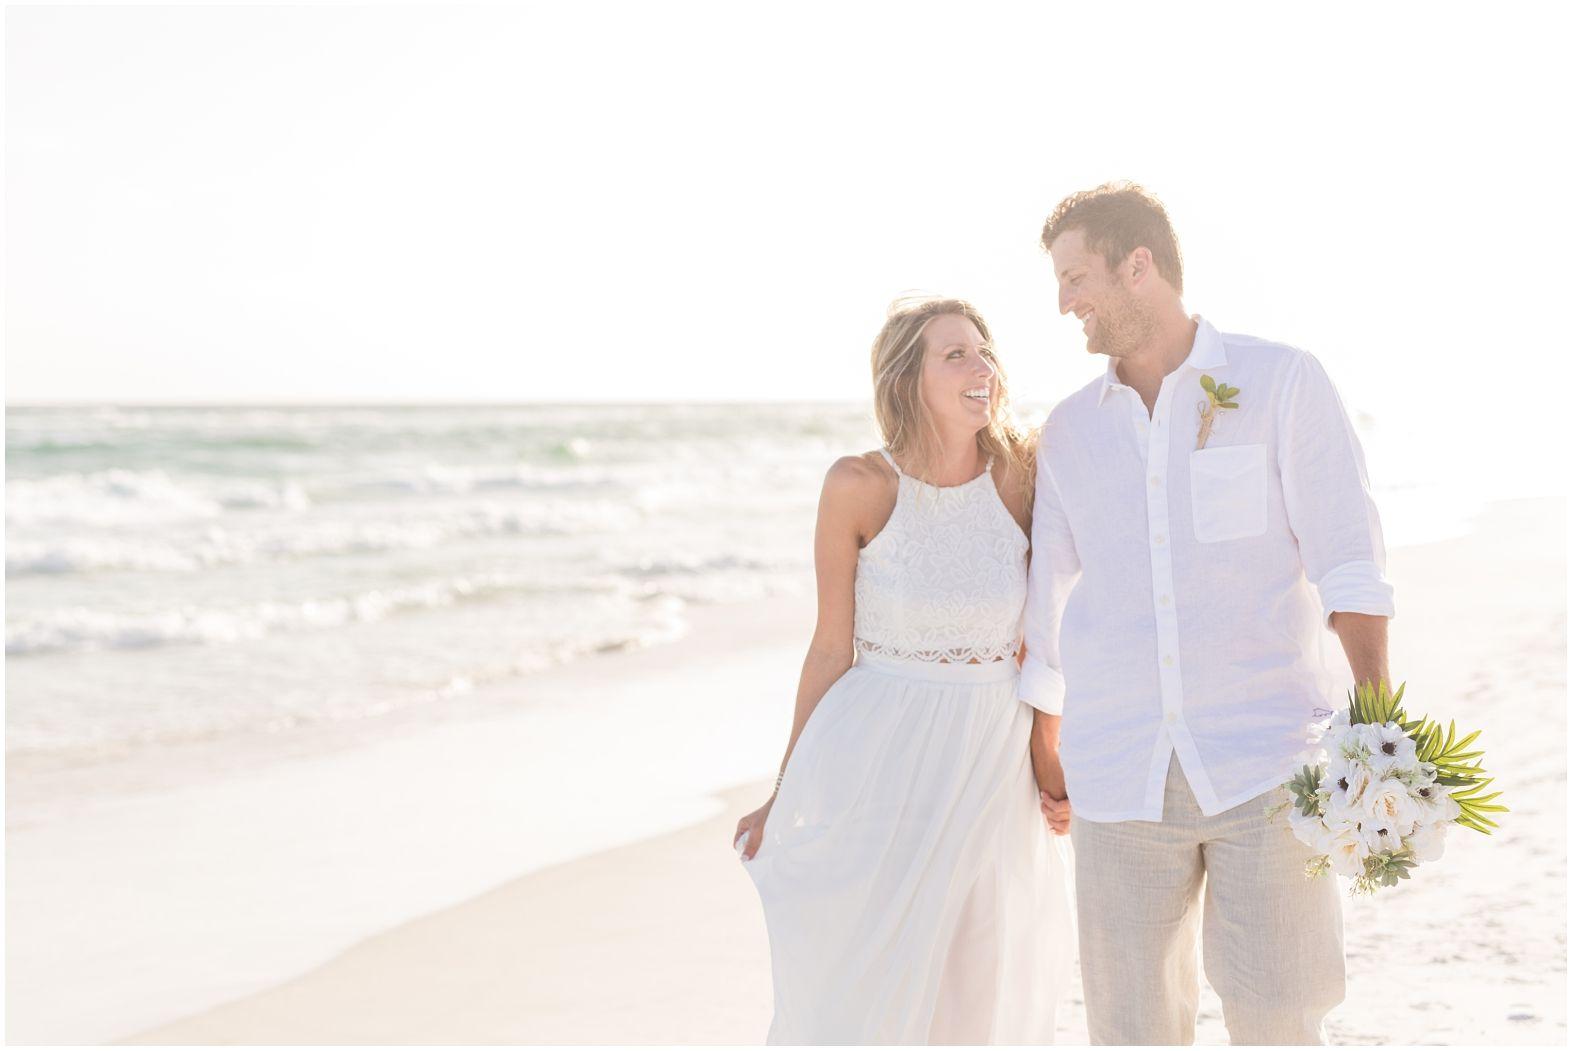 Santa Rosa Beach Destination Wedding Destin Fl Wedding Photographer Kimchristopherphoto Beach Destination Wedding Destination Wedding Wedding Photographers